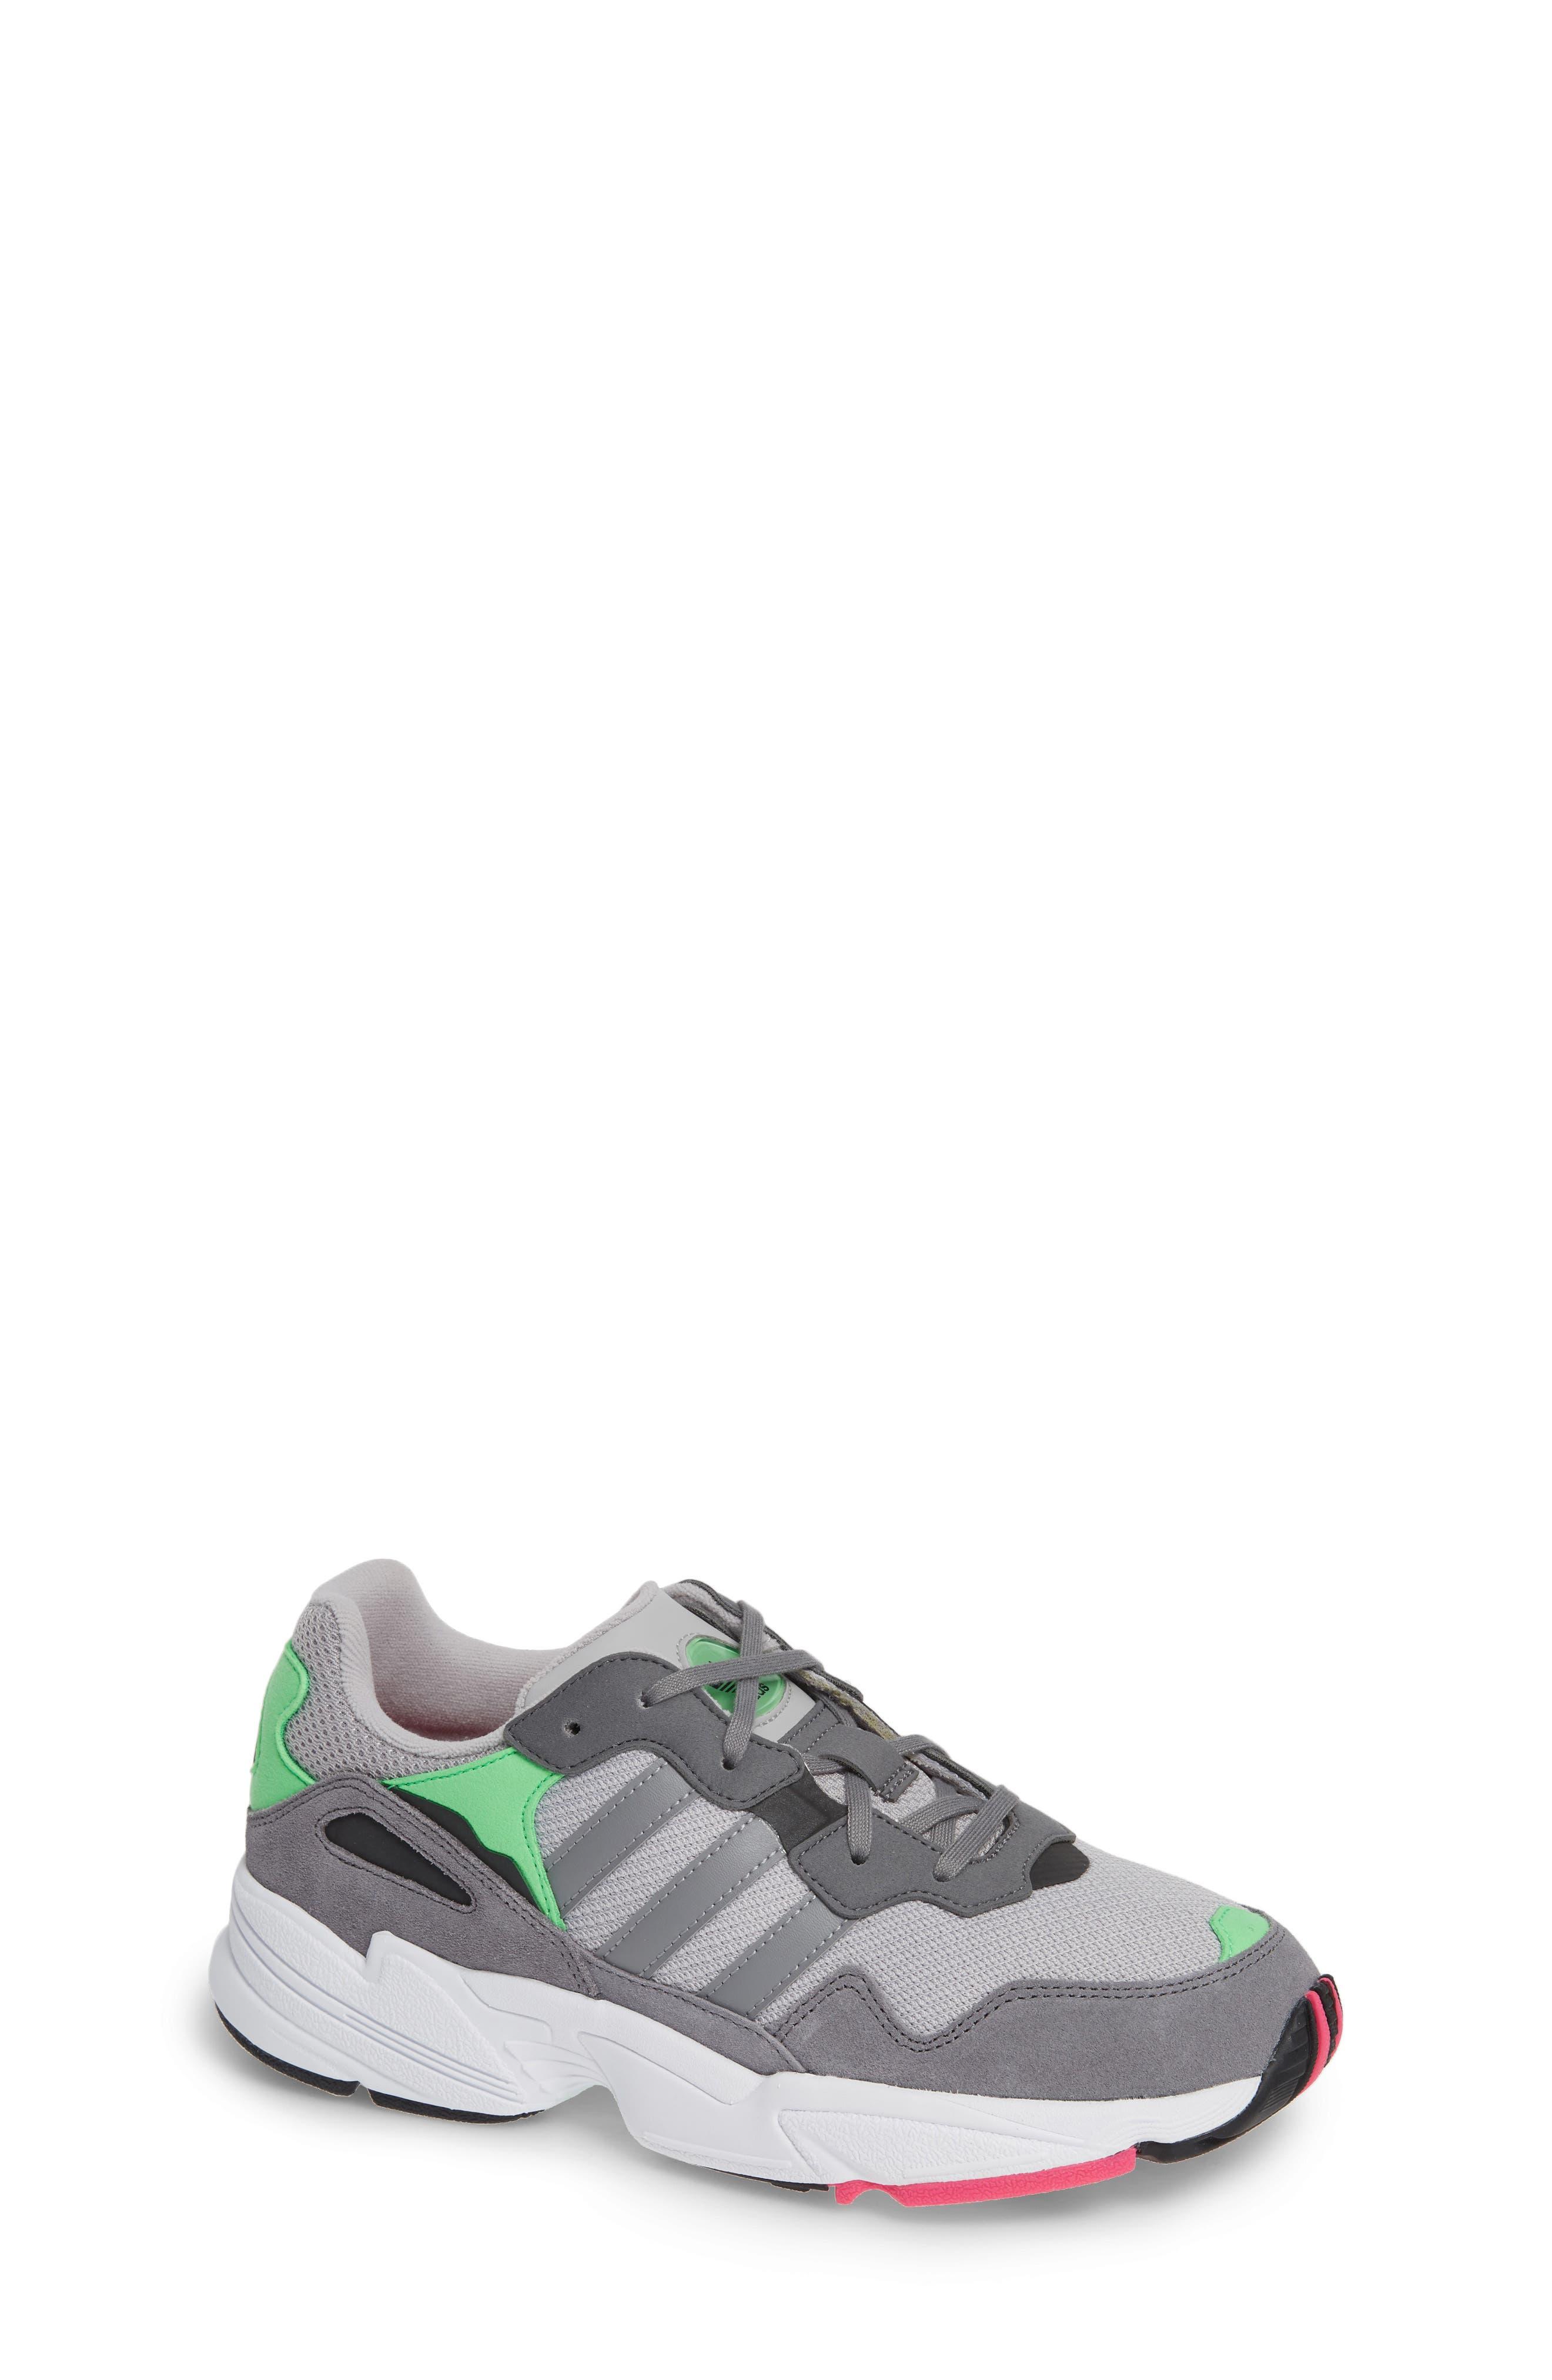 Kids Adidas Yung96 Sneaker Size 7 M  White